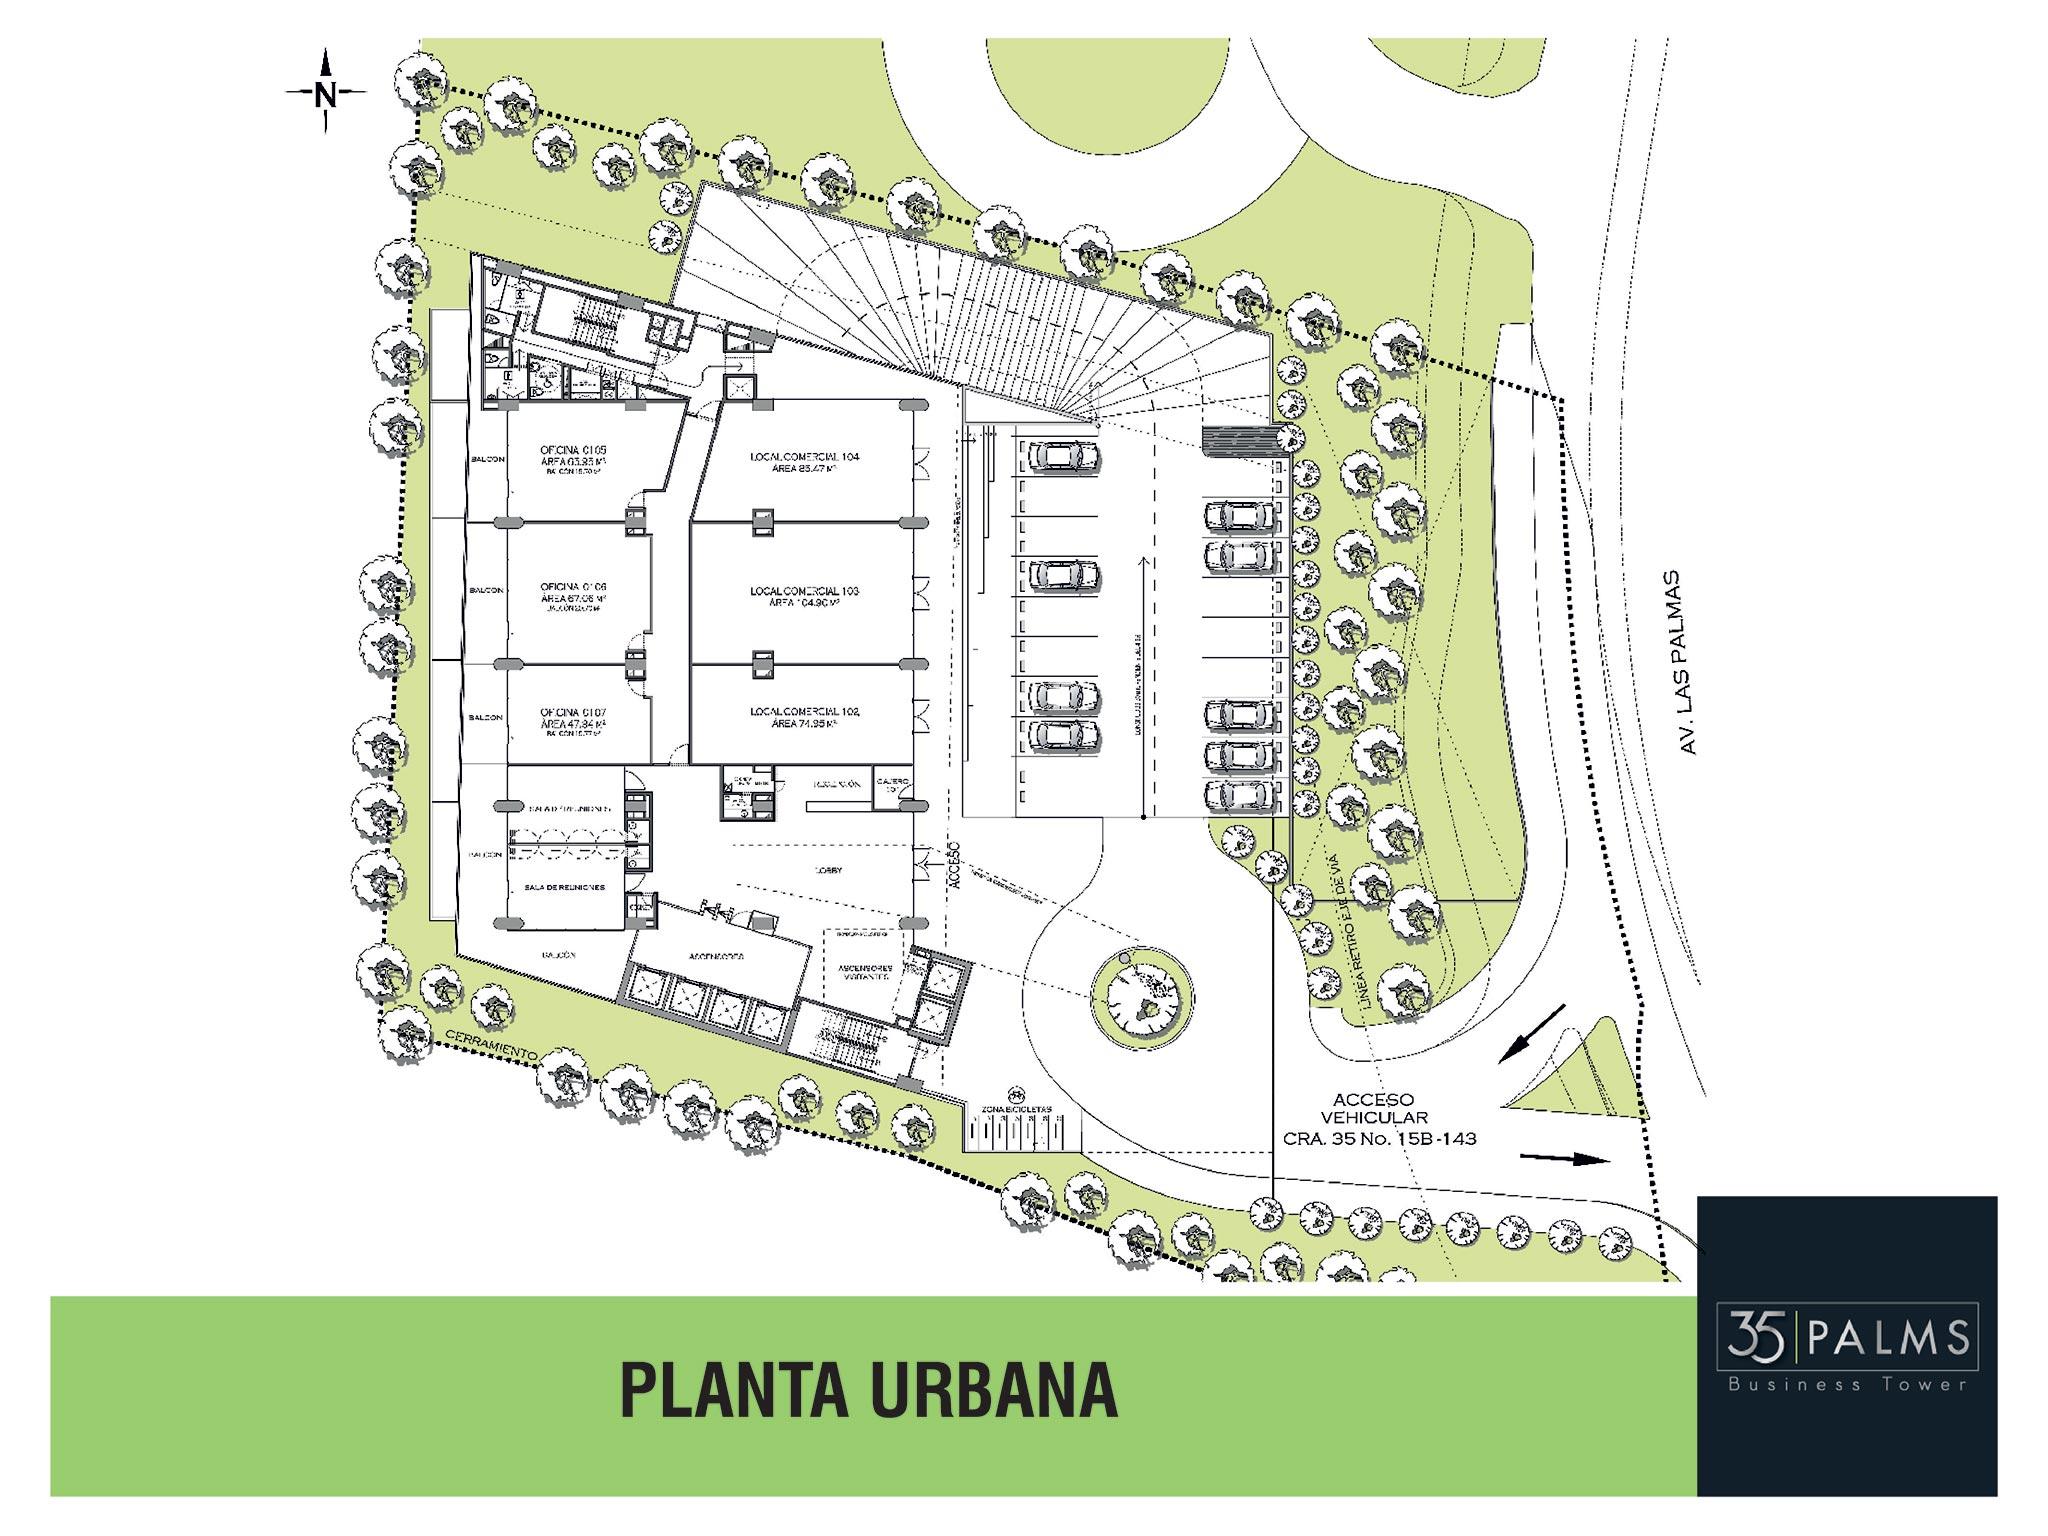 APARTAMENTOS EN MEDELLÍN - PLANTA URBANA 35 PALMS